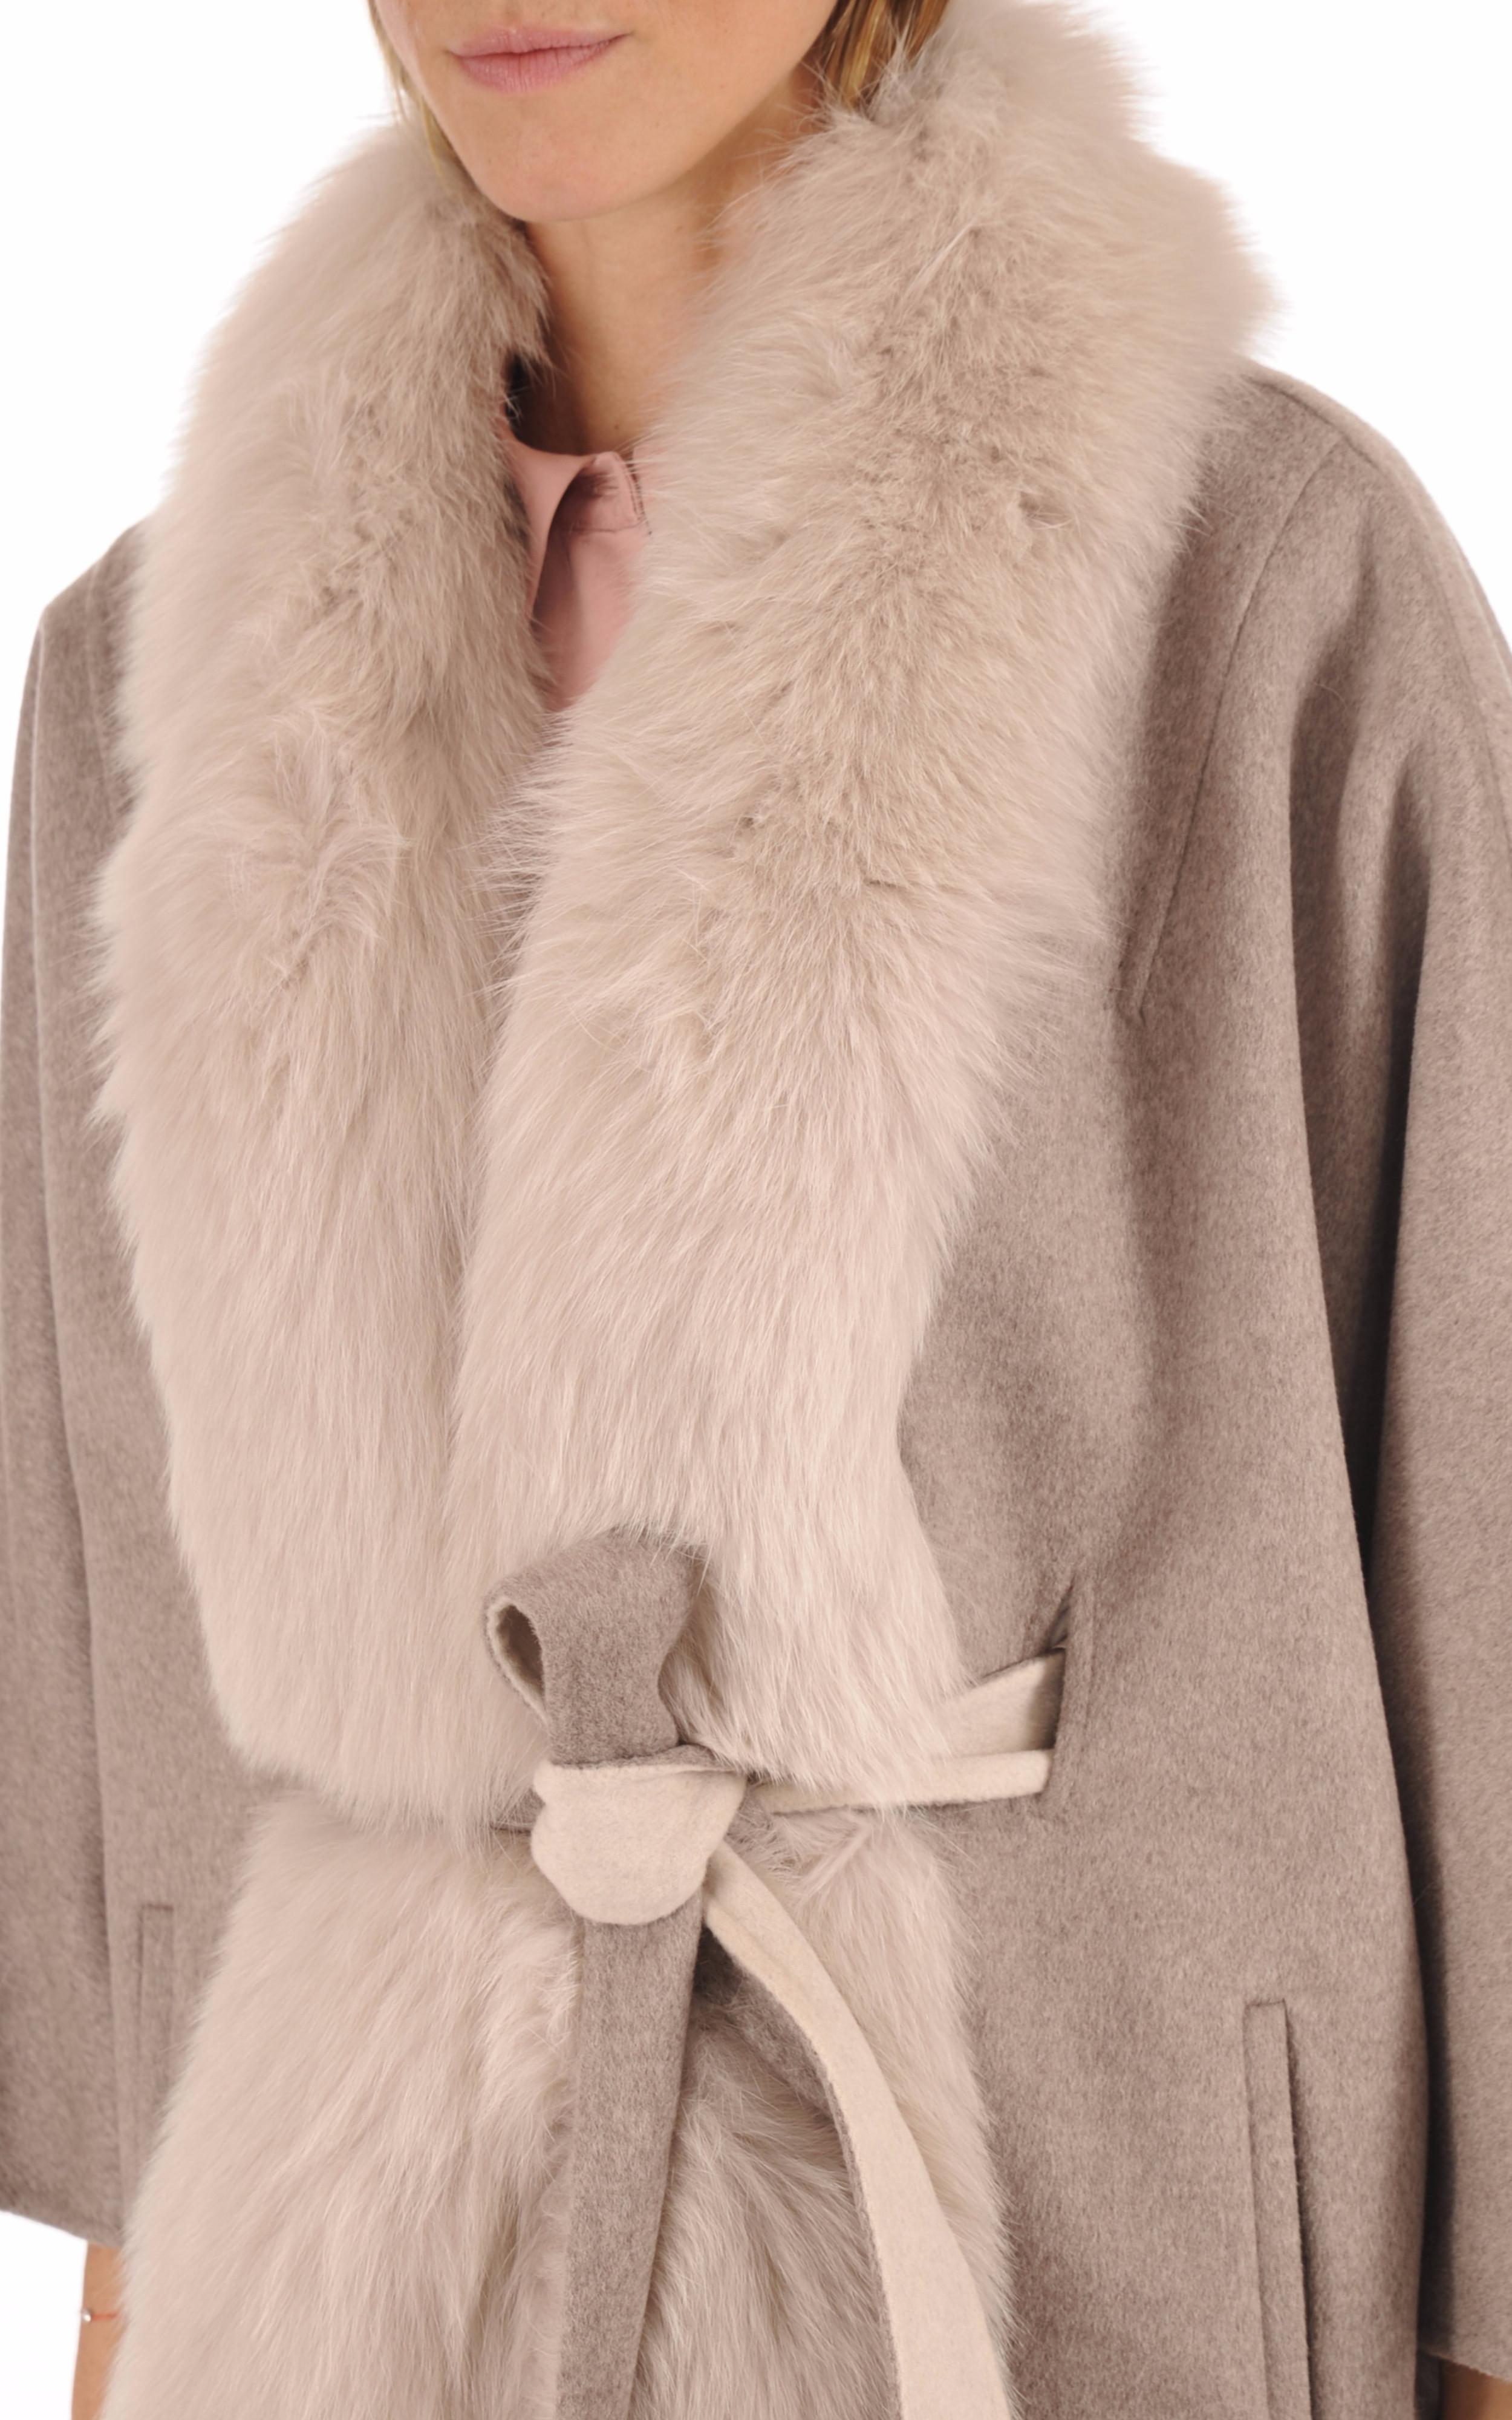 Veste Chic Kimono Renard & Cachemire La Canadienne